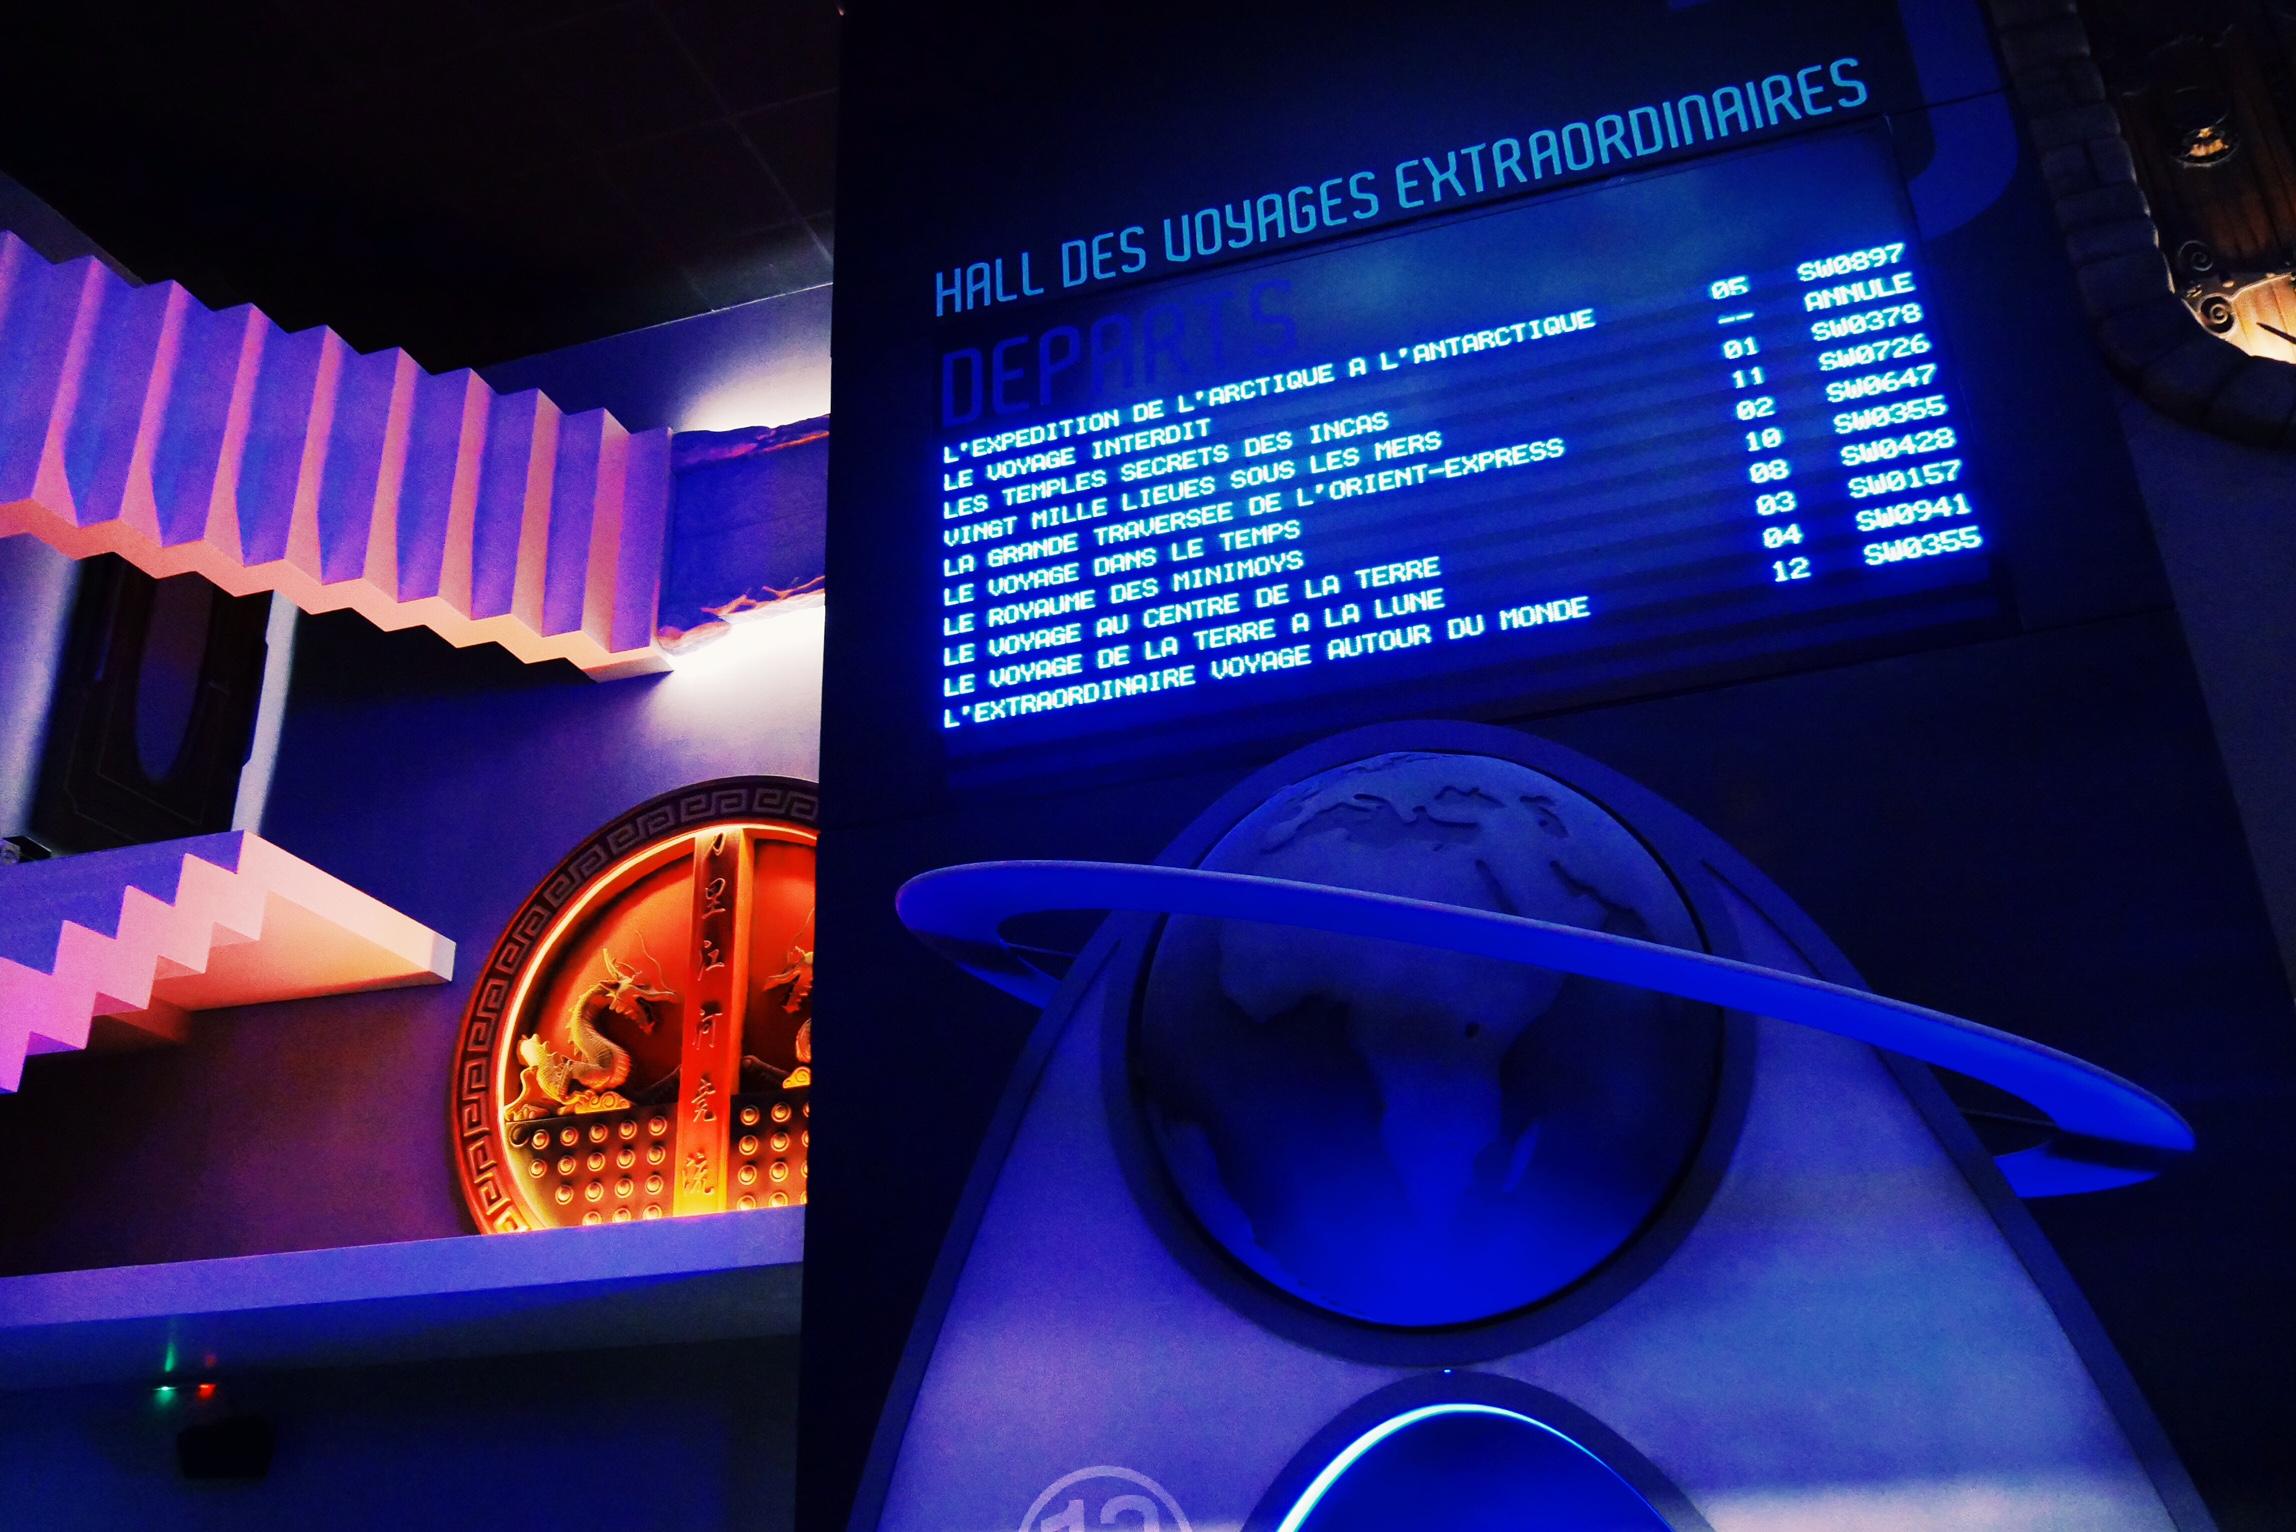 L-Extraordinaire-Voyage-Futuroscope-attraction-panneau-affichage-vols-accès-photo-usofparis-blog